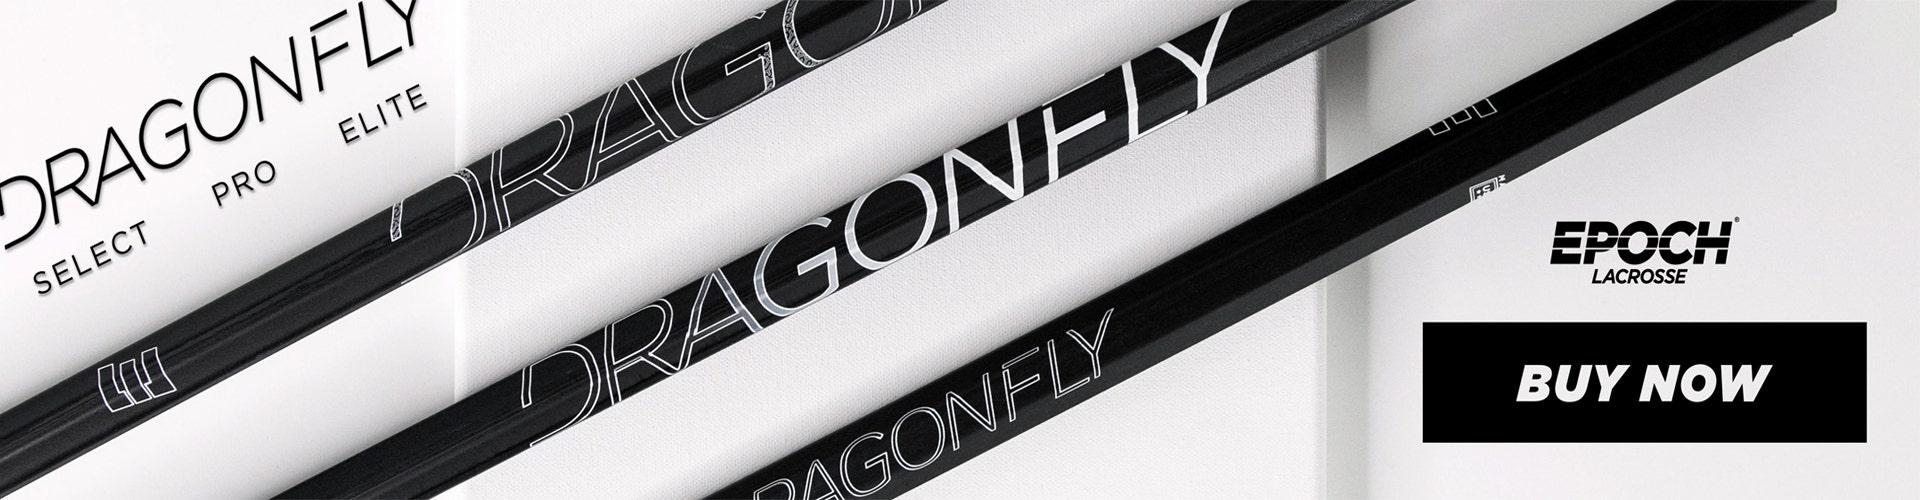 EPOCH Dragonfly Select - DESKTOP